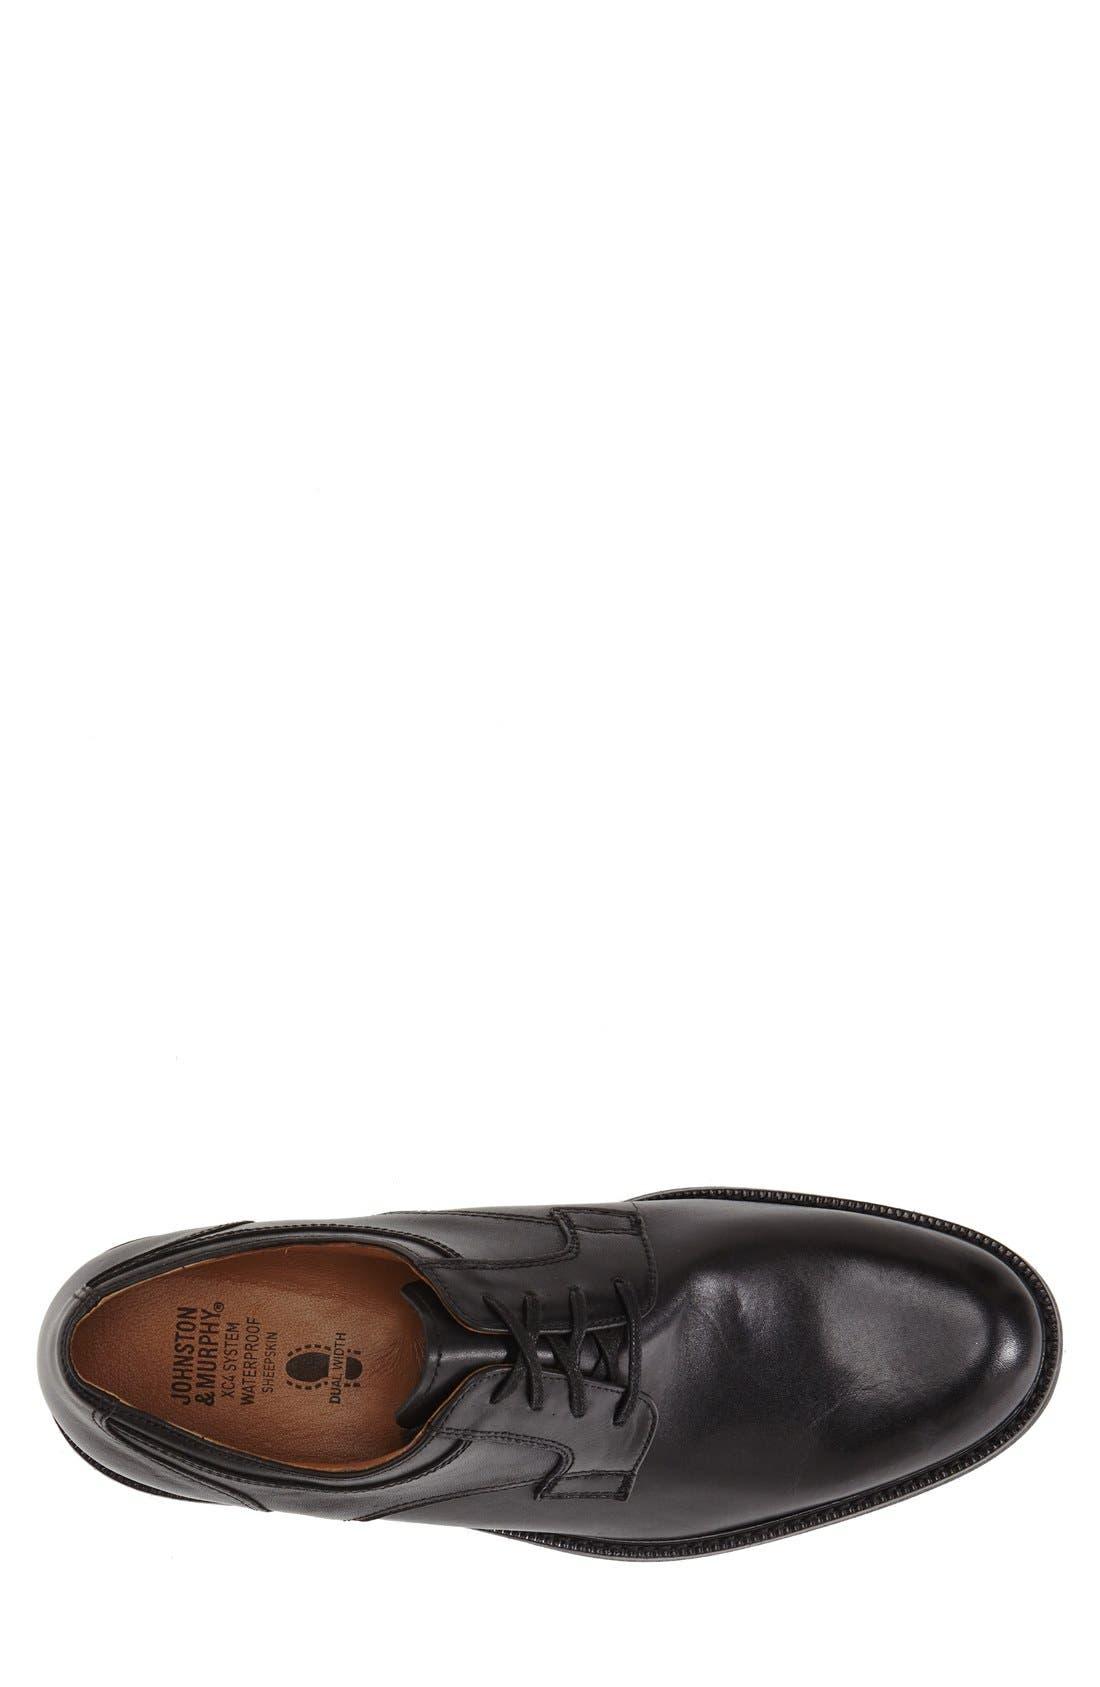 'Cardell' Plain Toe Derby,                             Alternate thumbnail 4, color,                             002